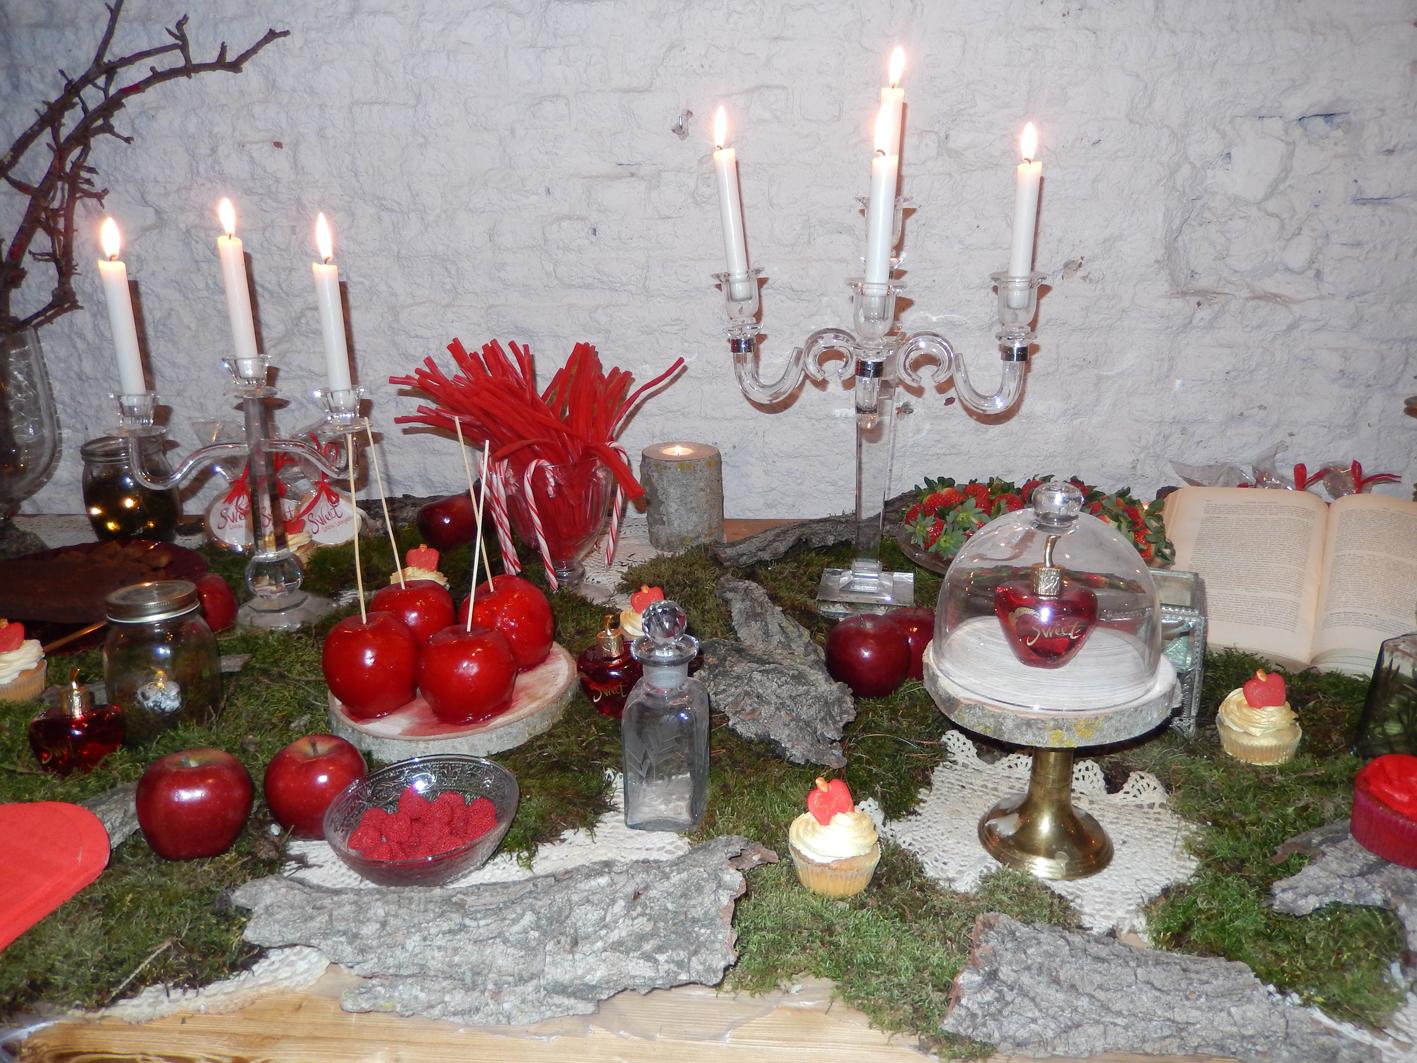 Mesa de dulces para presenta la fragancia Sweet, de Lolita Lempicka.